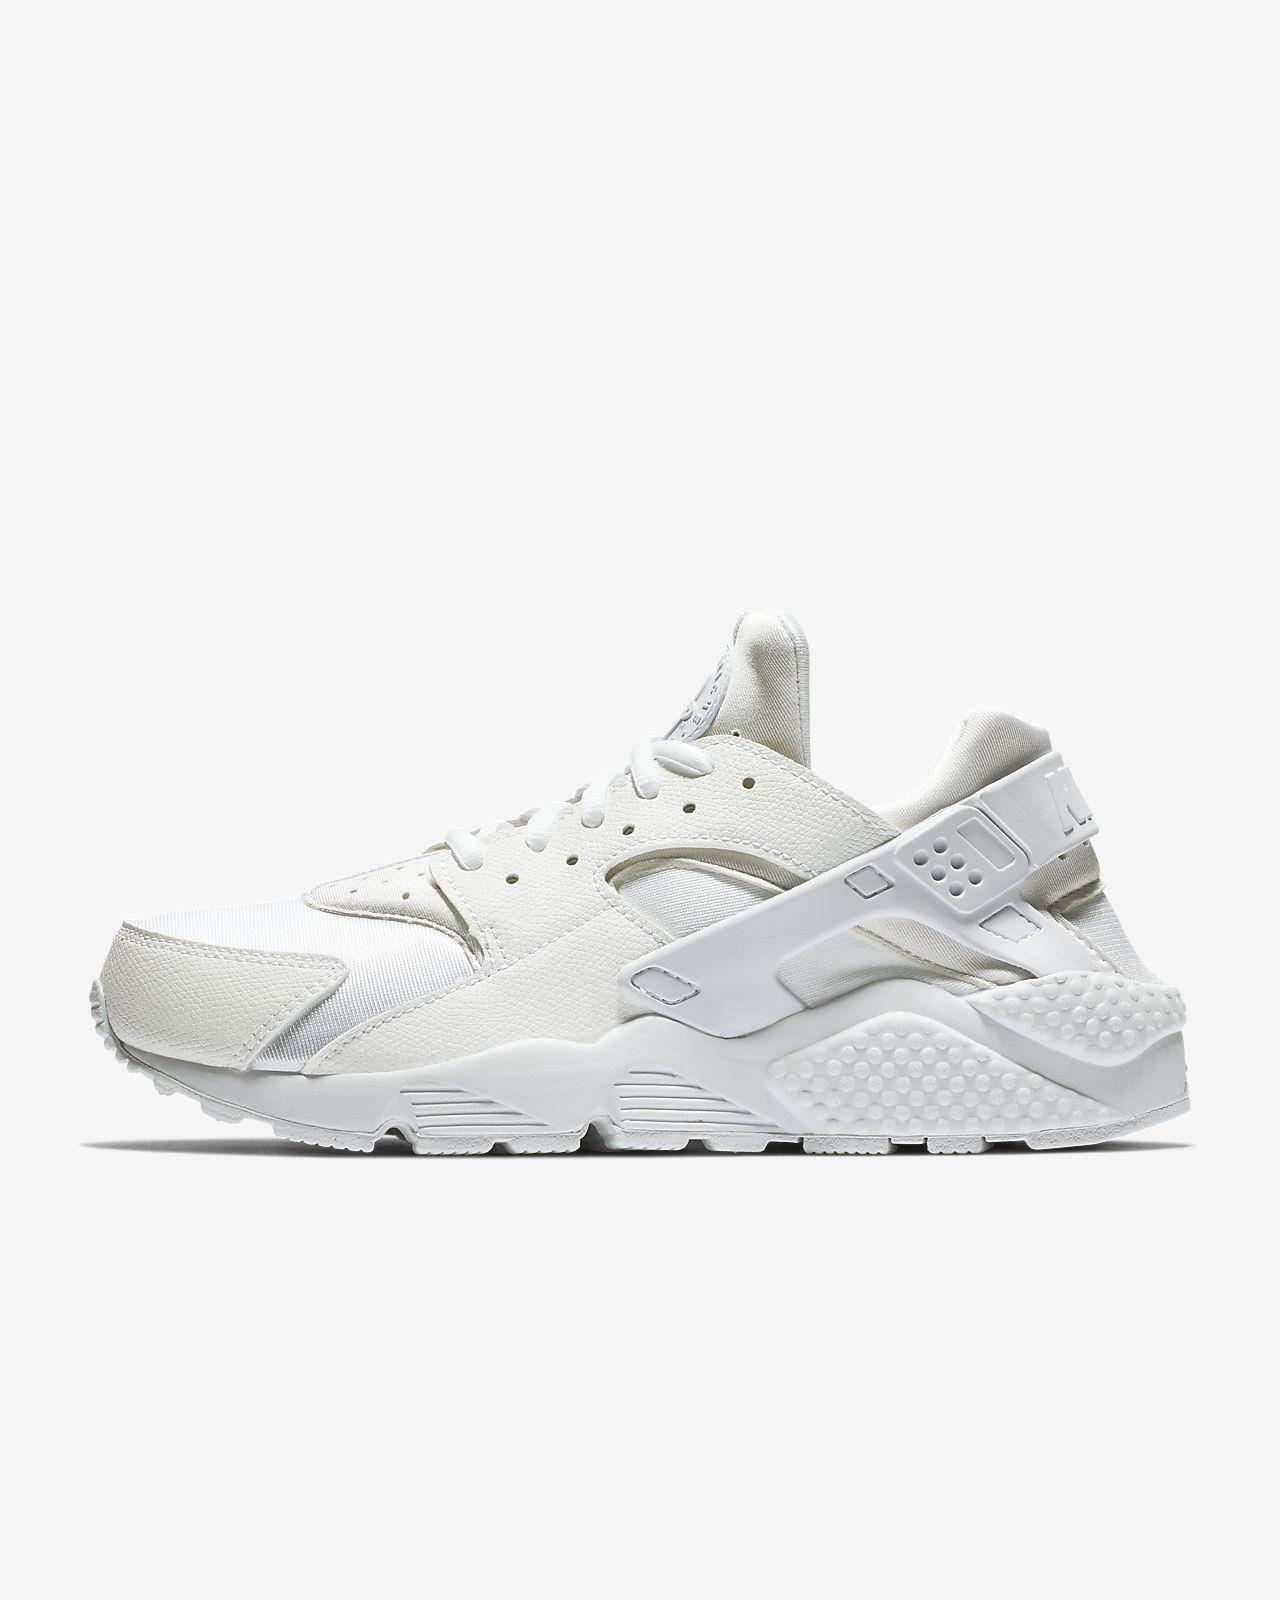 Sapatilhas Nike Air Huarache para mulher